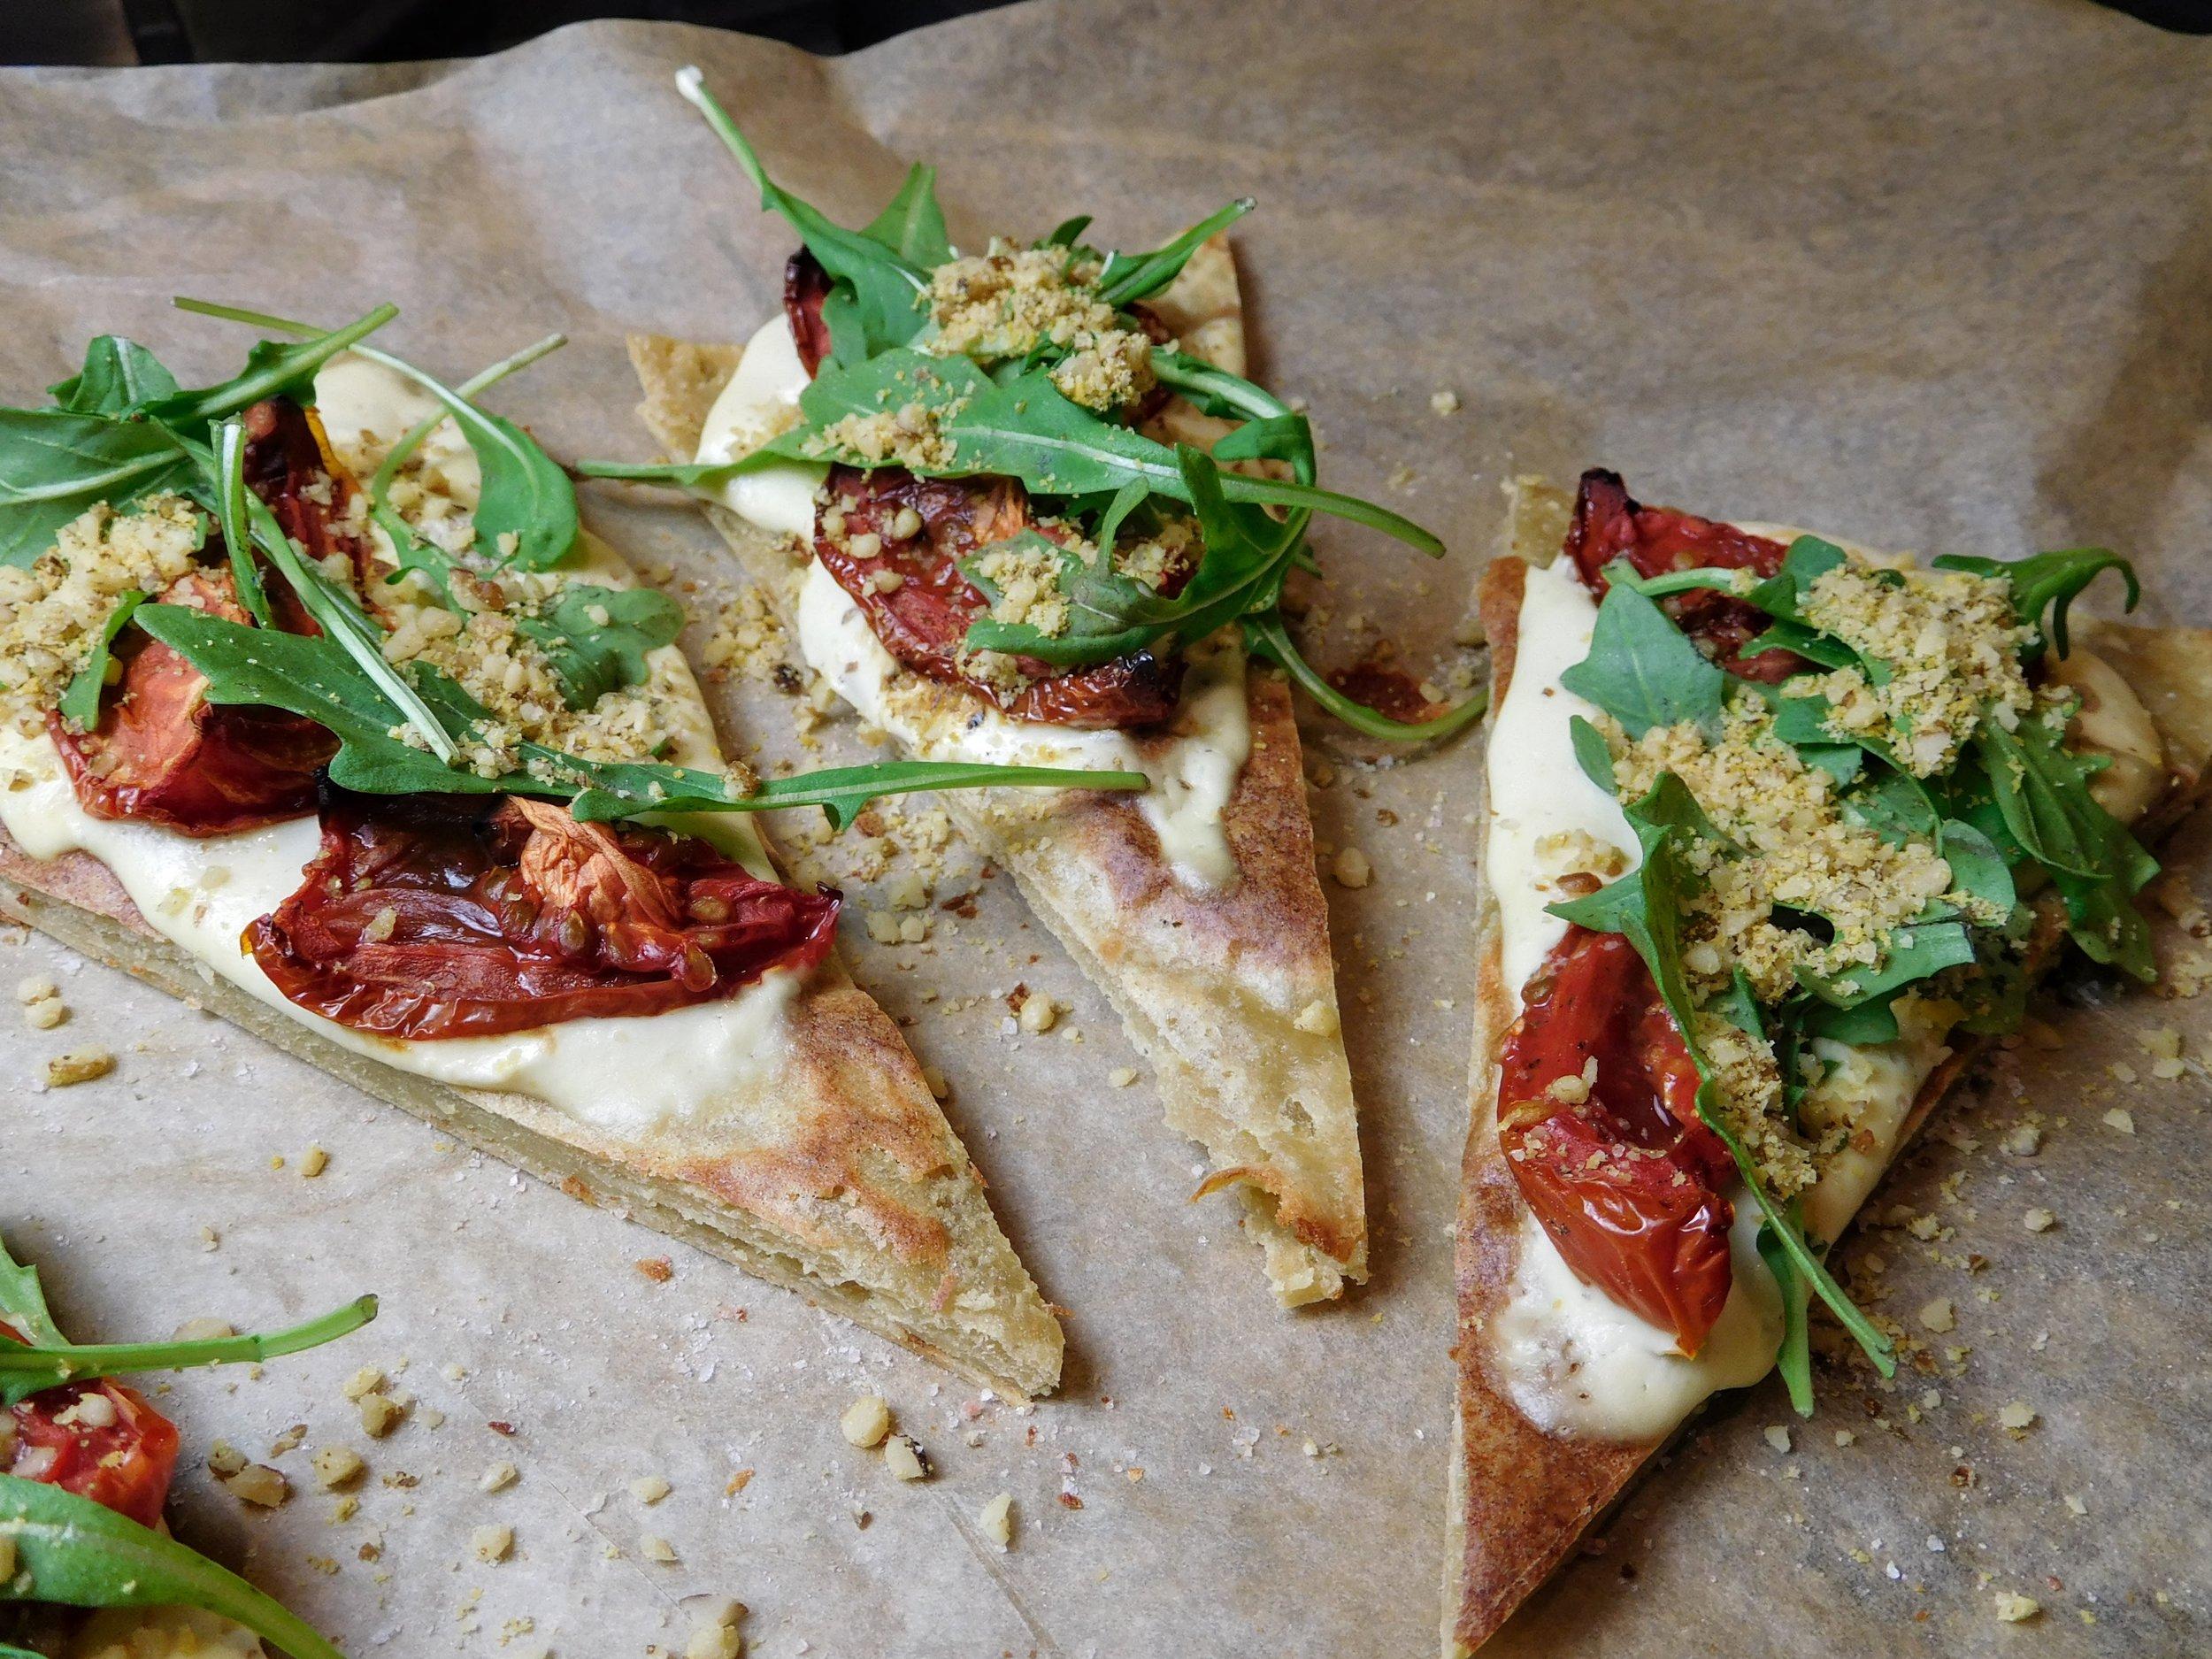 quinoa fb pizza 3 pieces.JPG